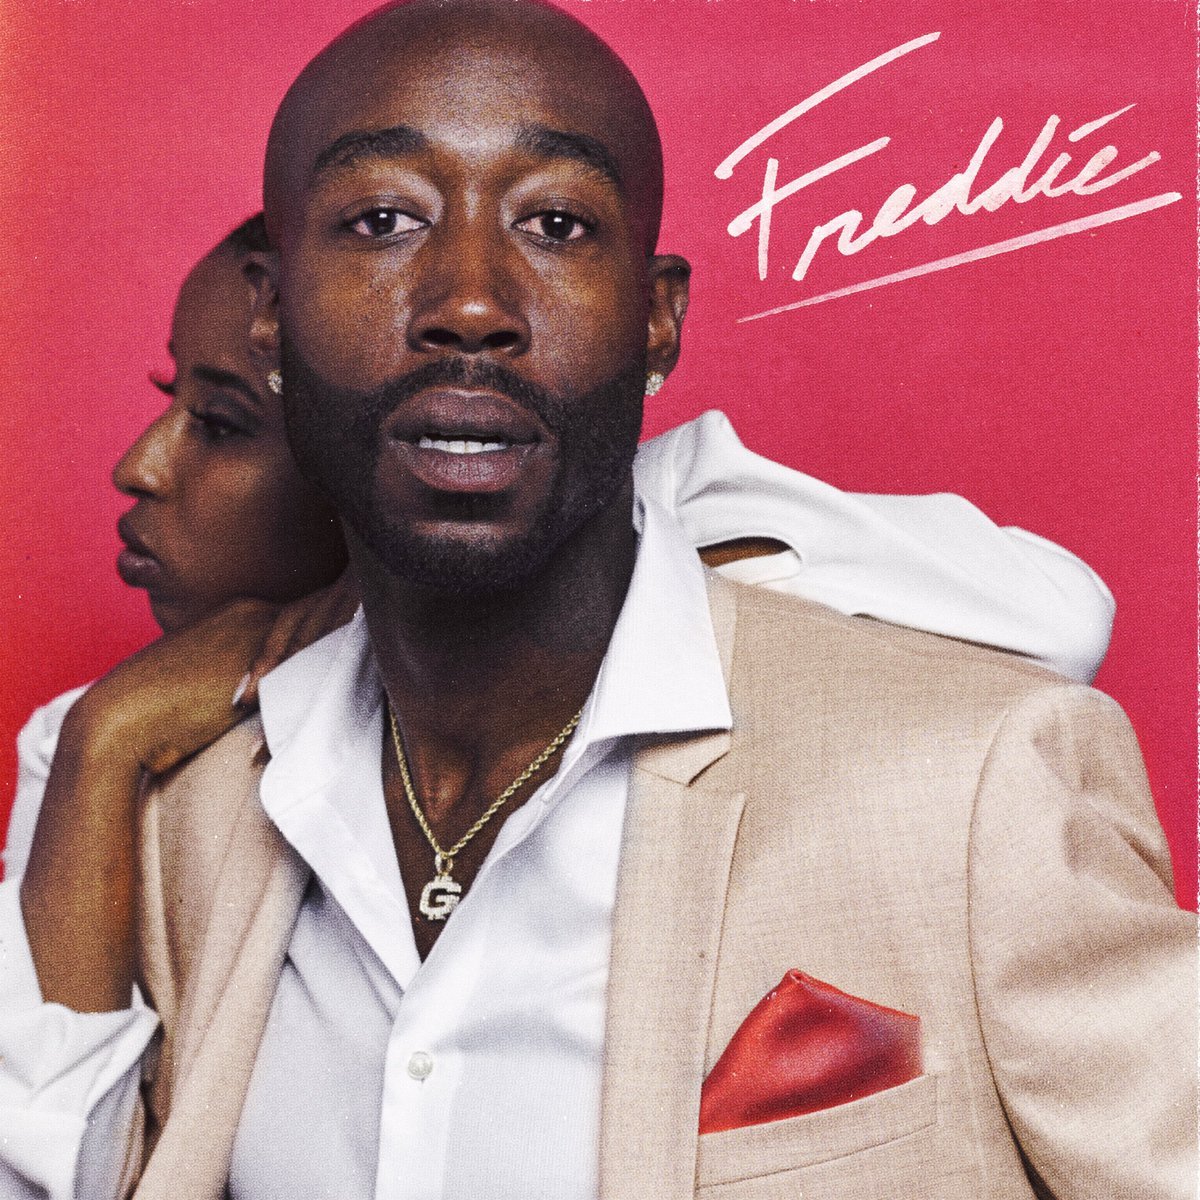 Freddie Gibbs releases a new 10-track album titled Freddie. Stream it here: bit.ly/FreddieAlbumSt…